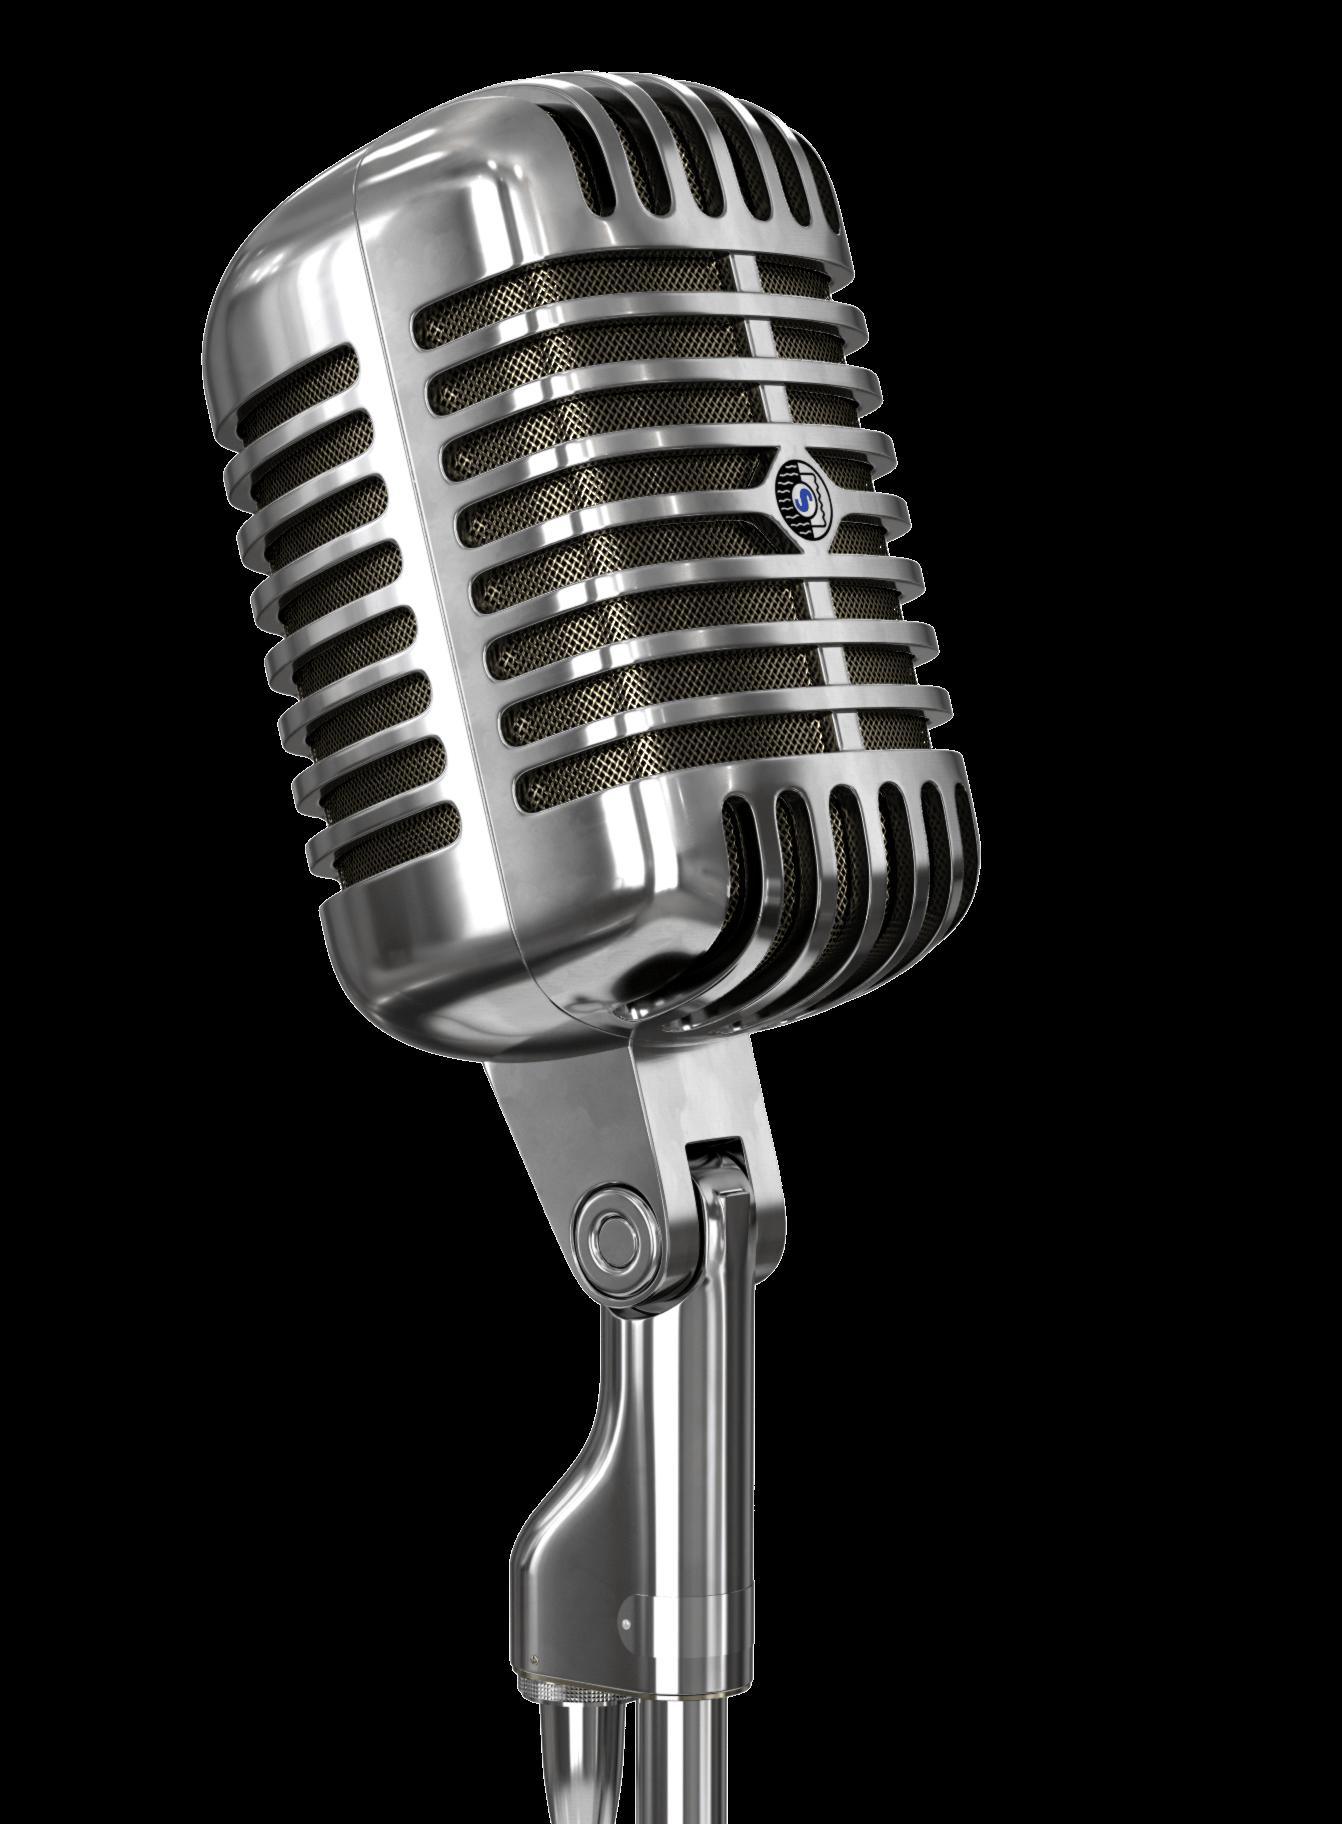 Microphone Png Transparent Vintage Microphone Old Microphone Microphone Tattoo